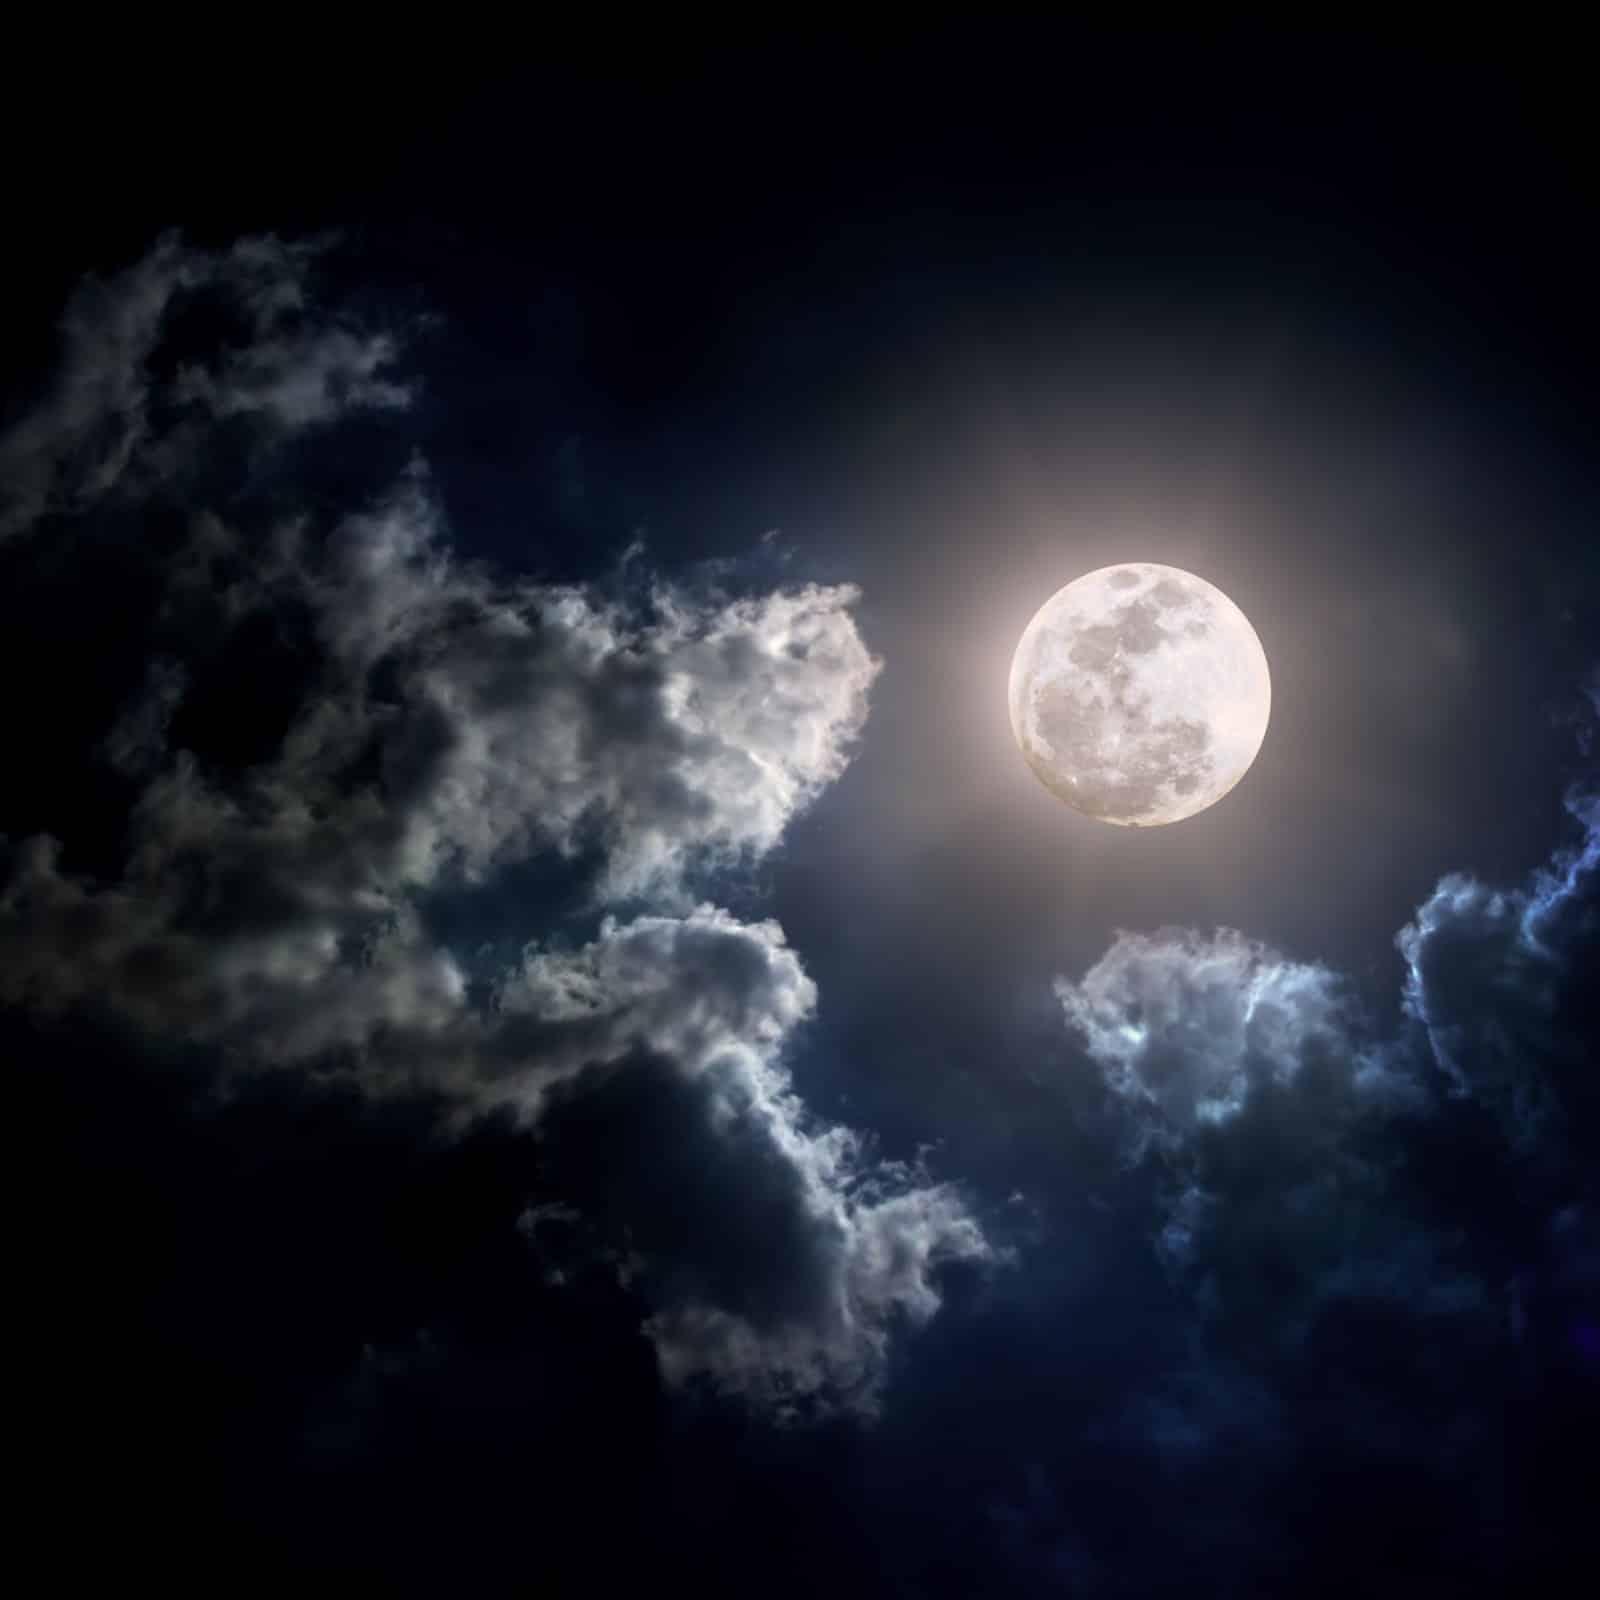 Fullmoon دانلود موسیقی سابلیمینال همراه با درام - ماه - فروشگاه هیلند سنگ های معدنی